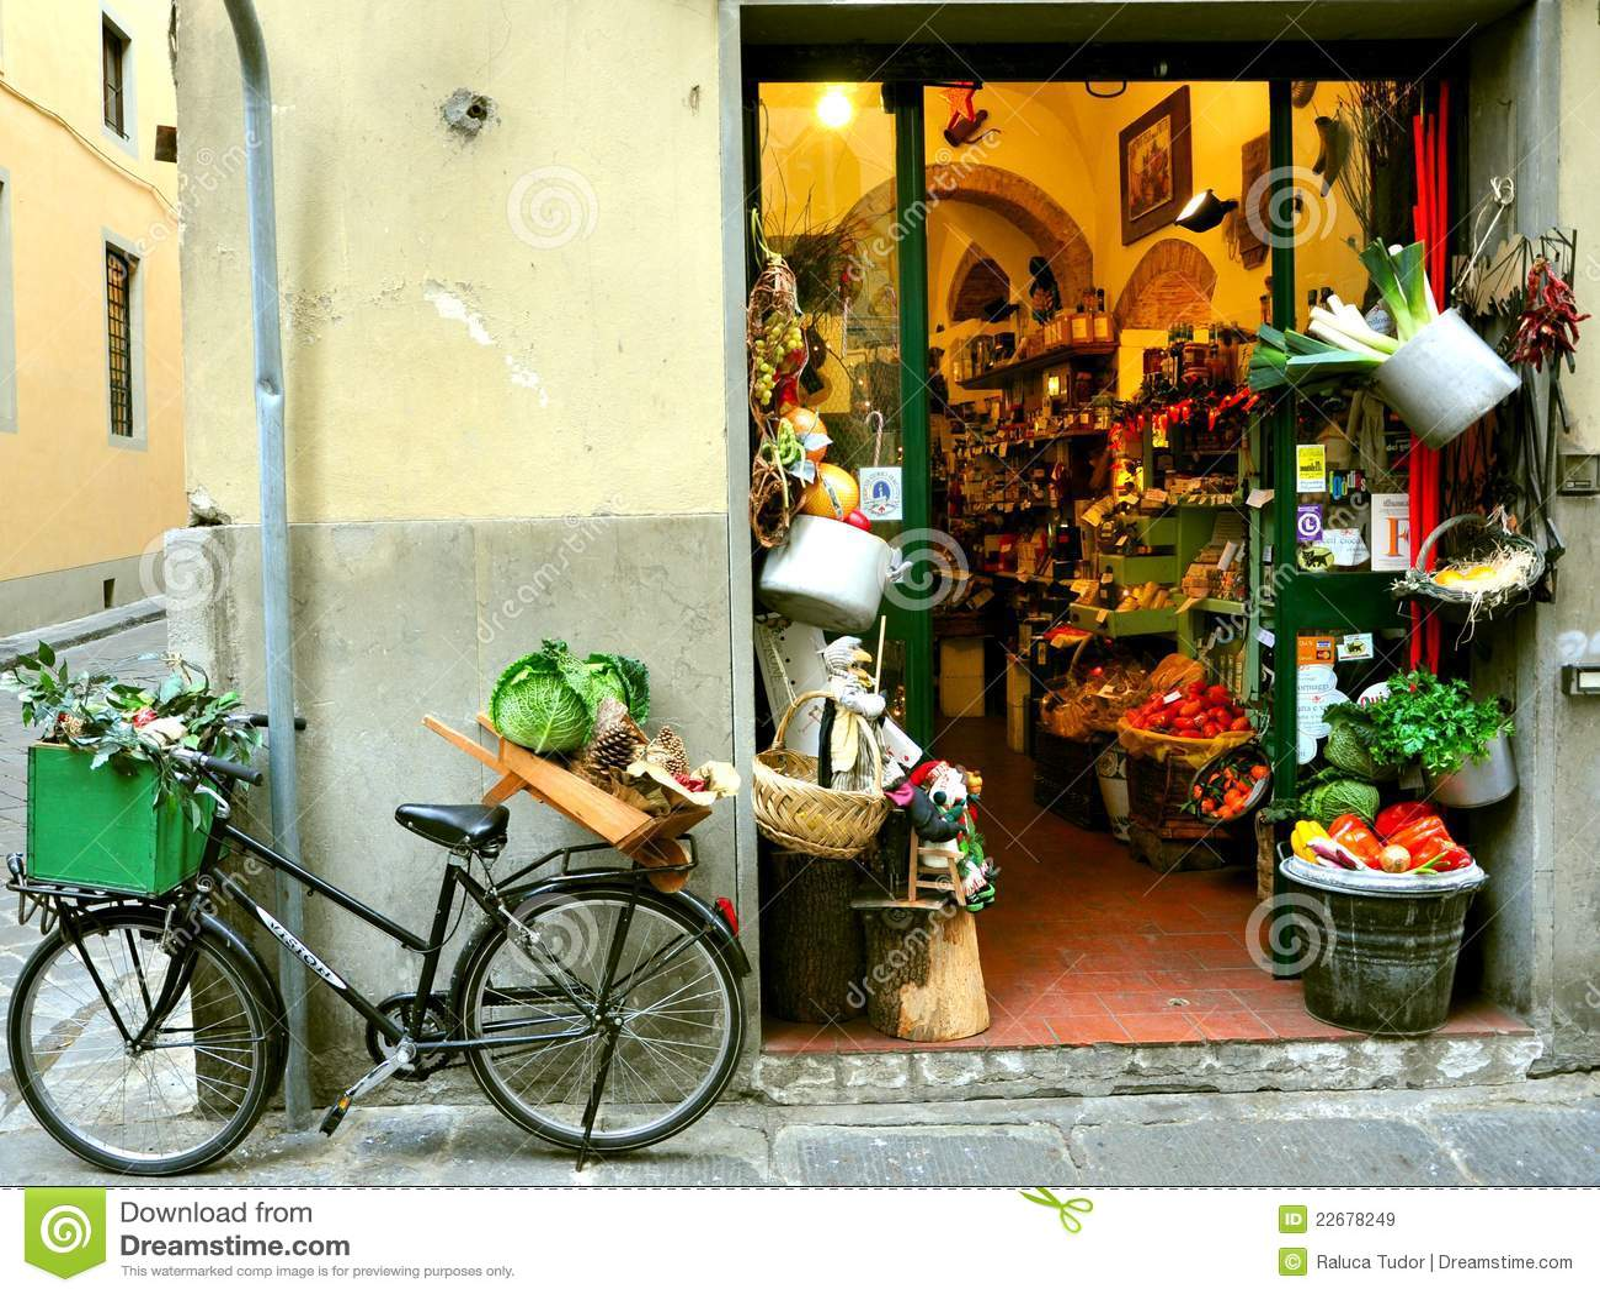 Livsmedelsbutiken italy shoppar typisk